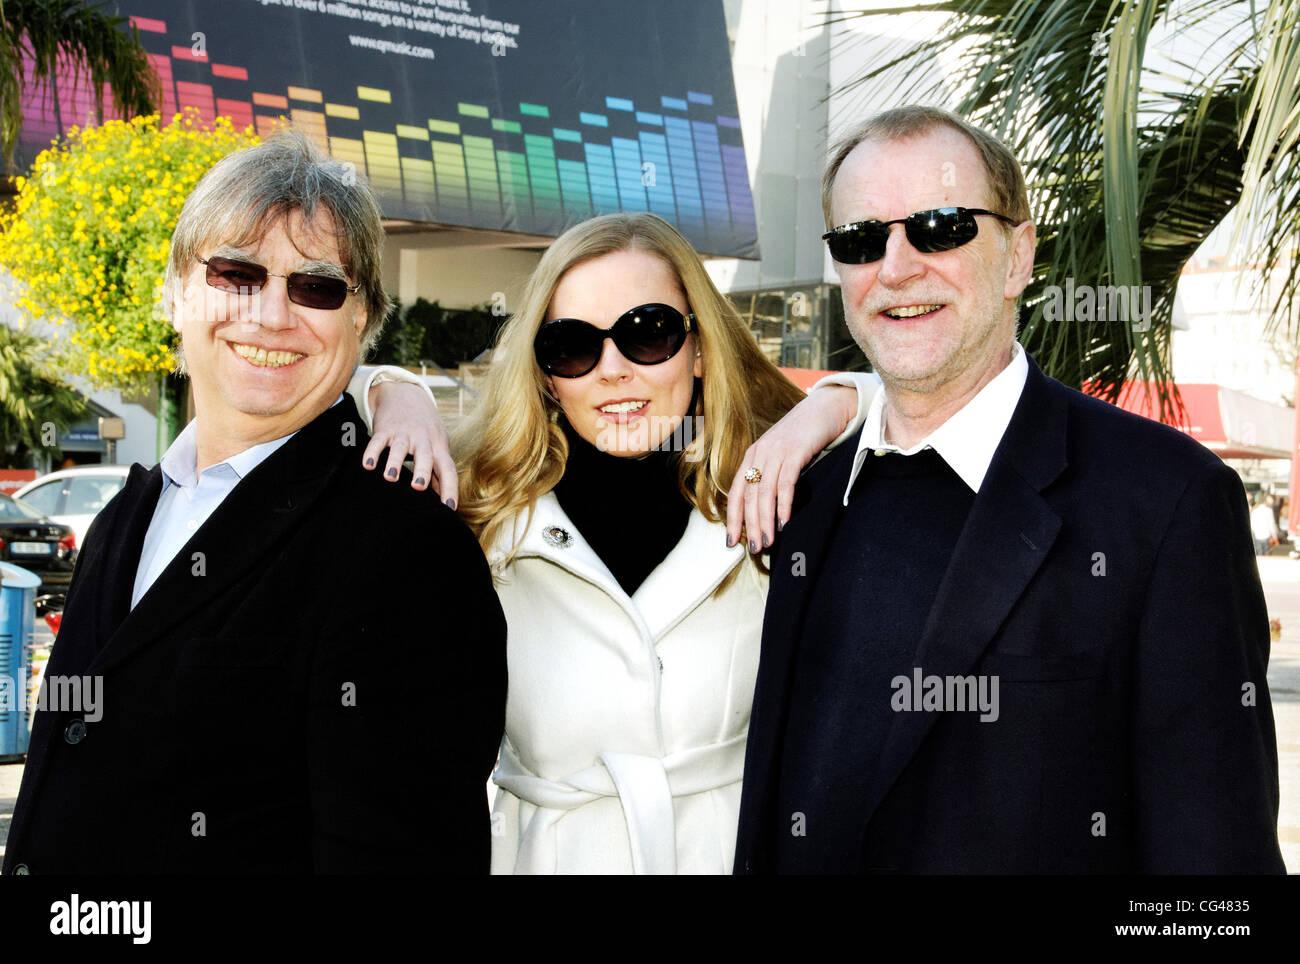 Graham Preskett, artist Marina Laslo and Producer Robin Millar promote Marina Laslo's new album 'Night & Day' at MIDEM - photocall Cannes, France - 25.01.11 Stock Photo